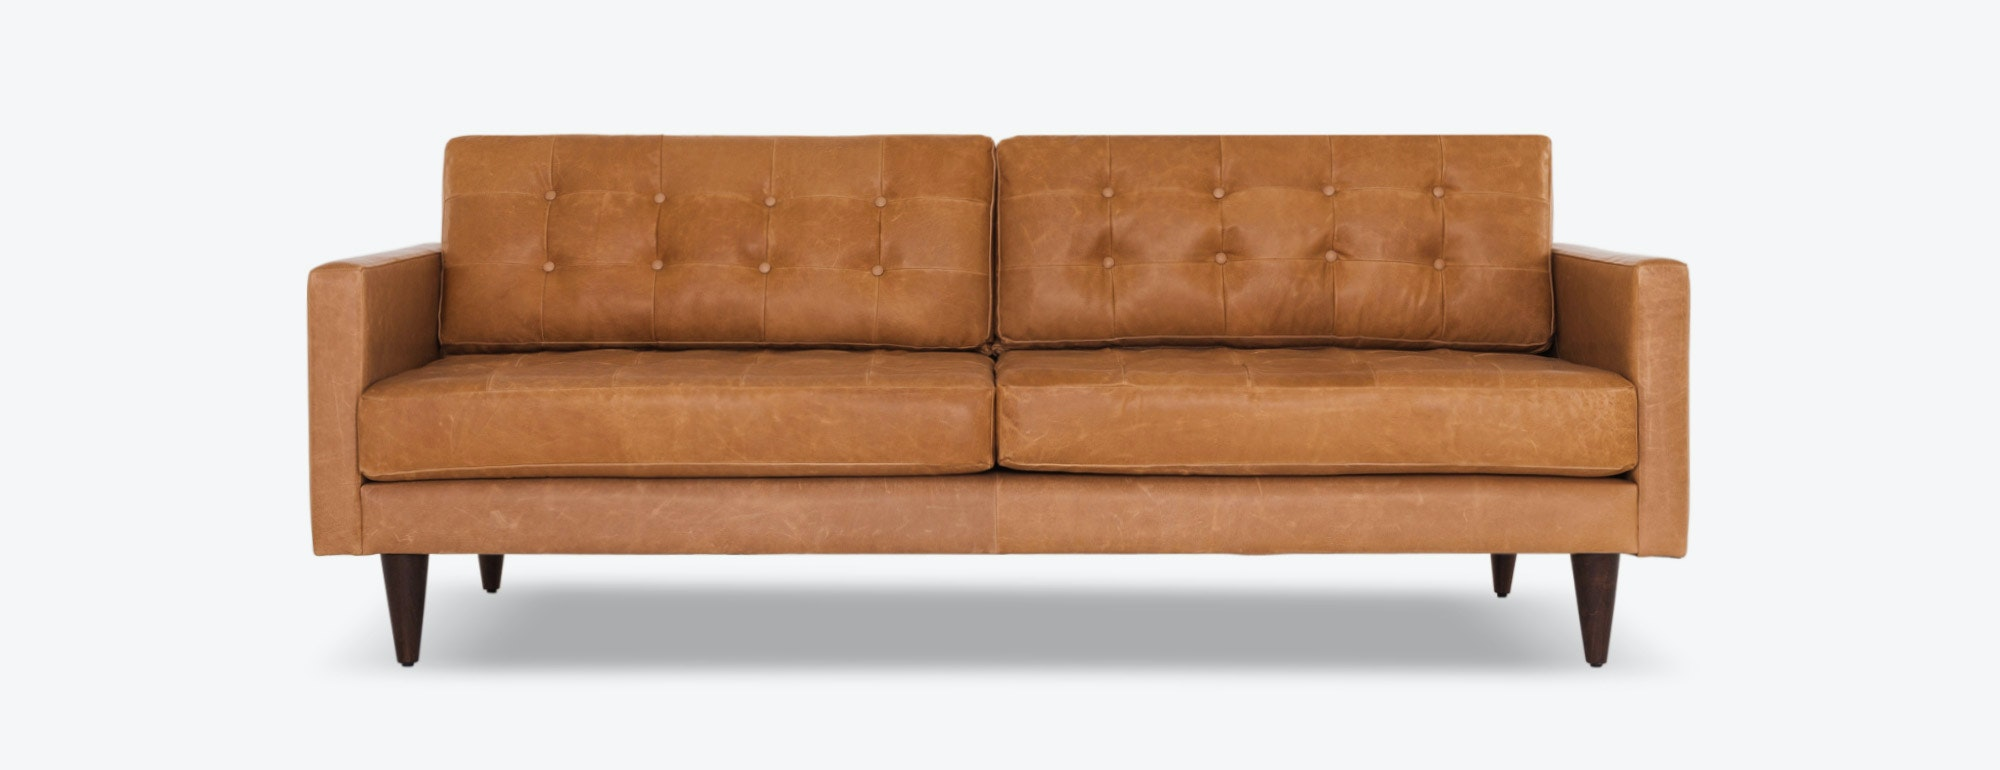 shown in Colonade Sycamore Leather